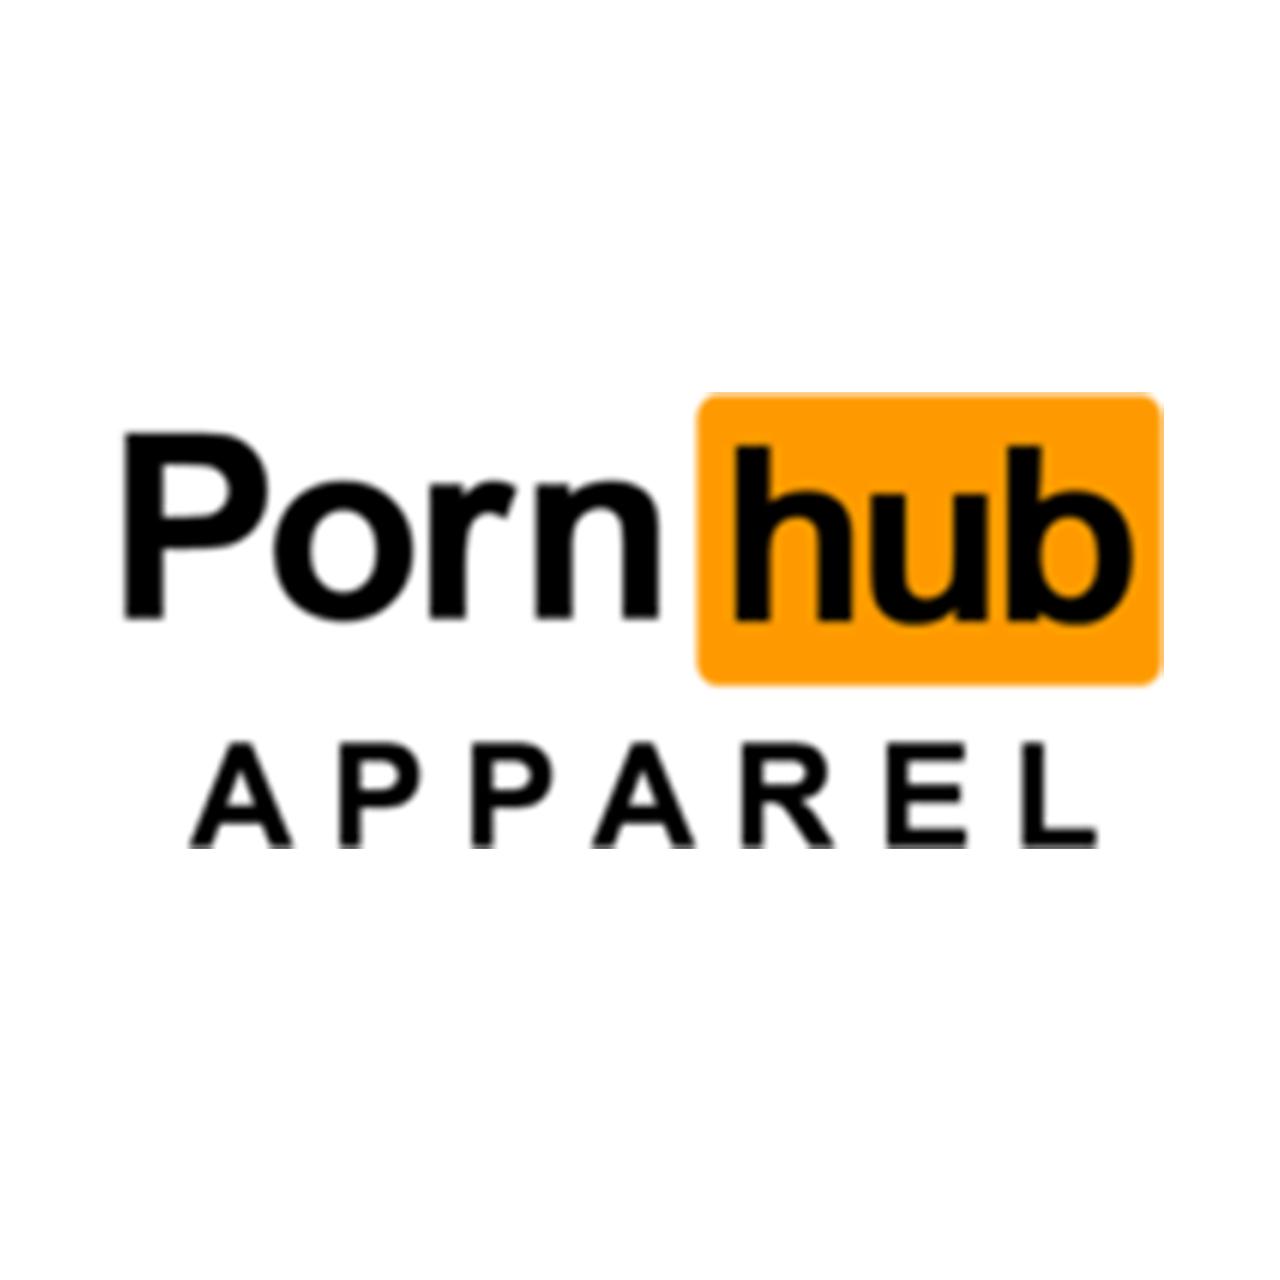 20% Korting @ Pornhub Apparel